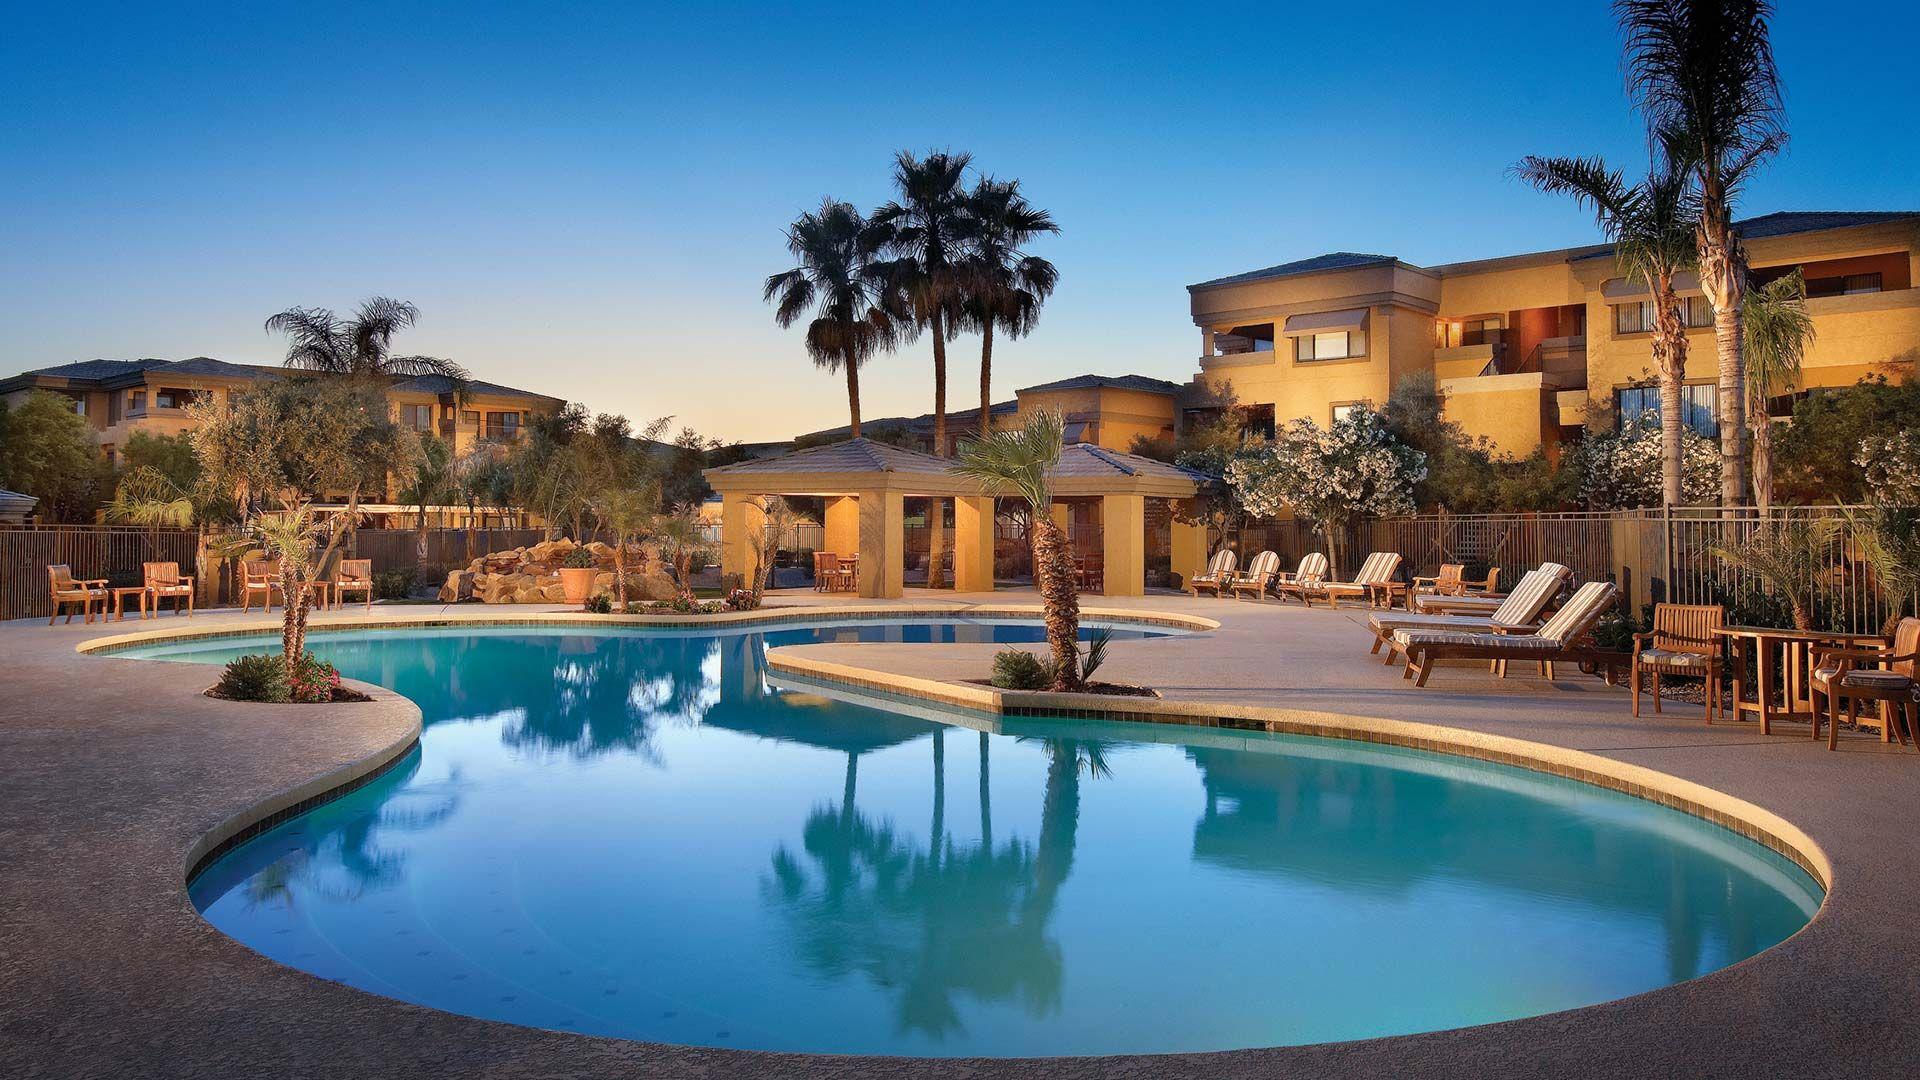 Mark Taylor Homes Chandler Az Apartments Waterside At Ocotillo Apartments For Rent Apartment Chandler Az